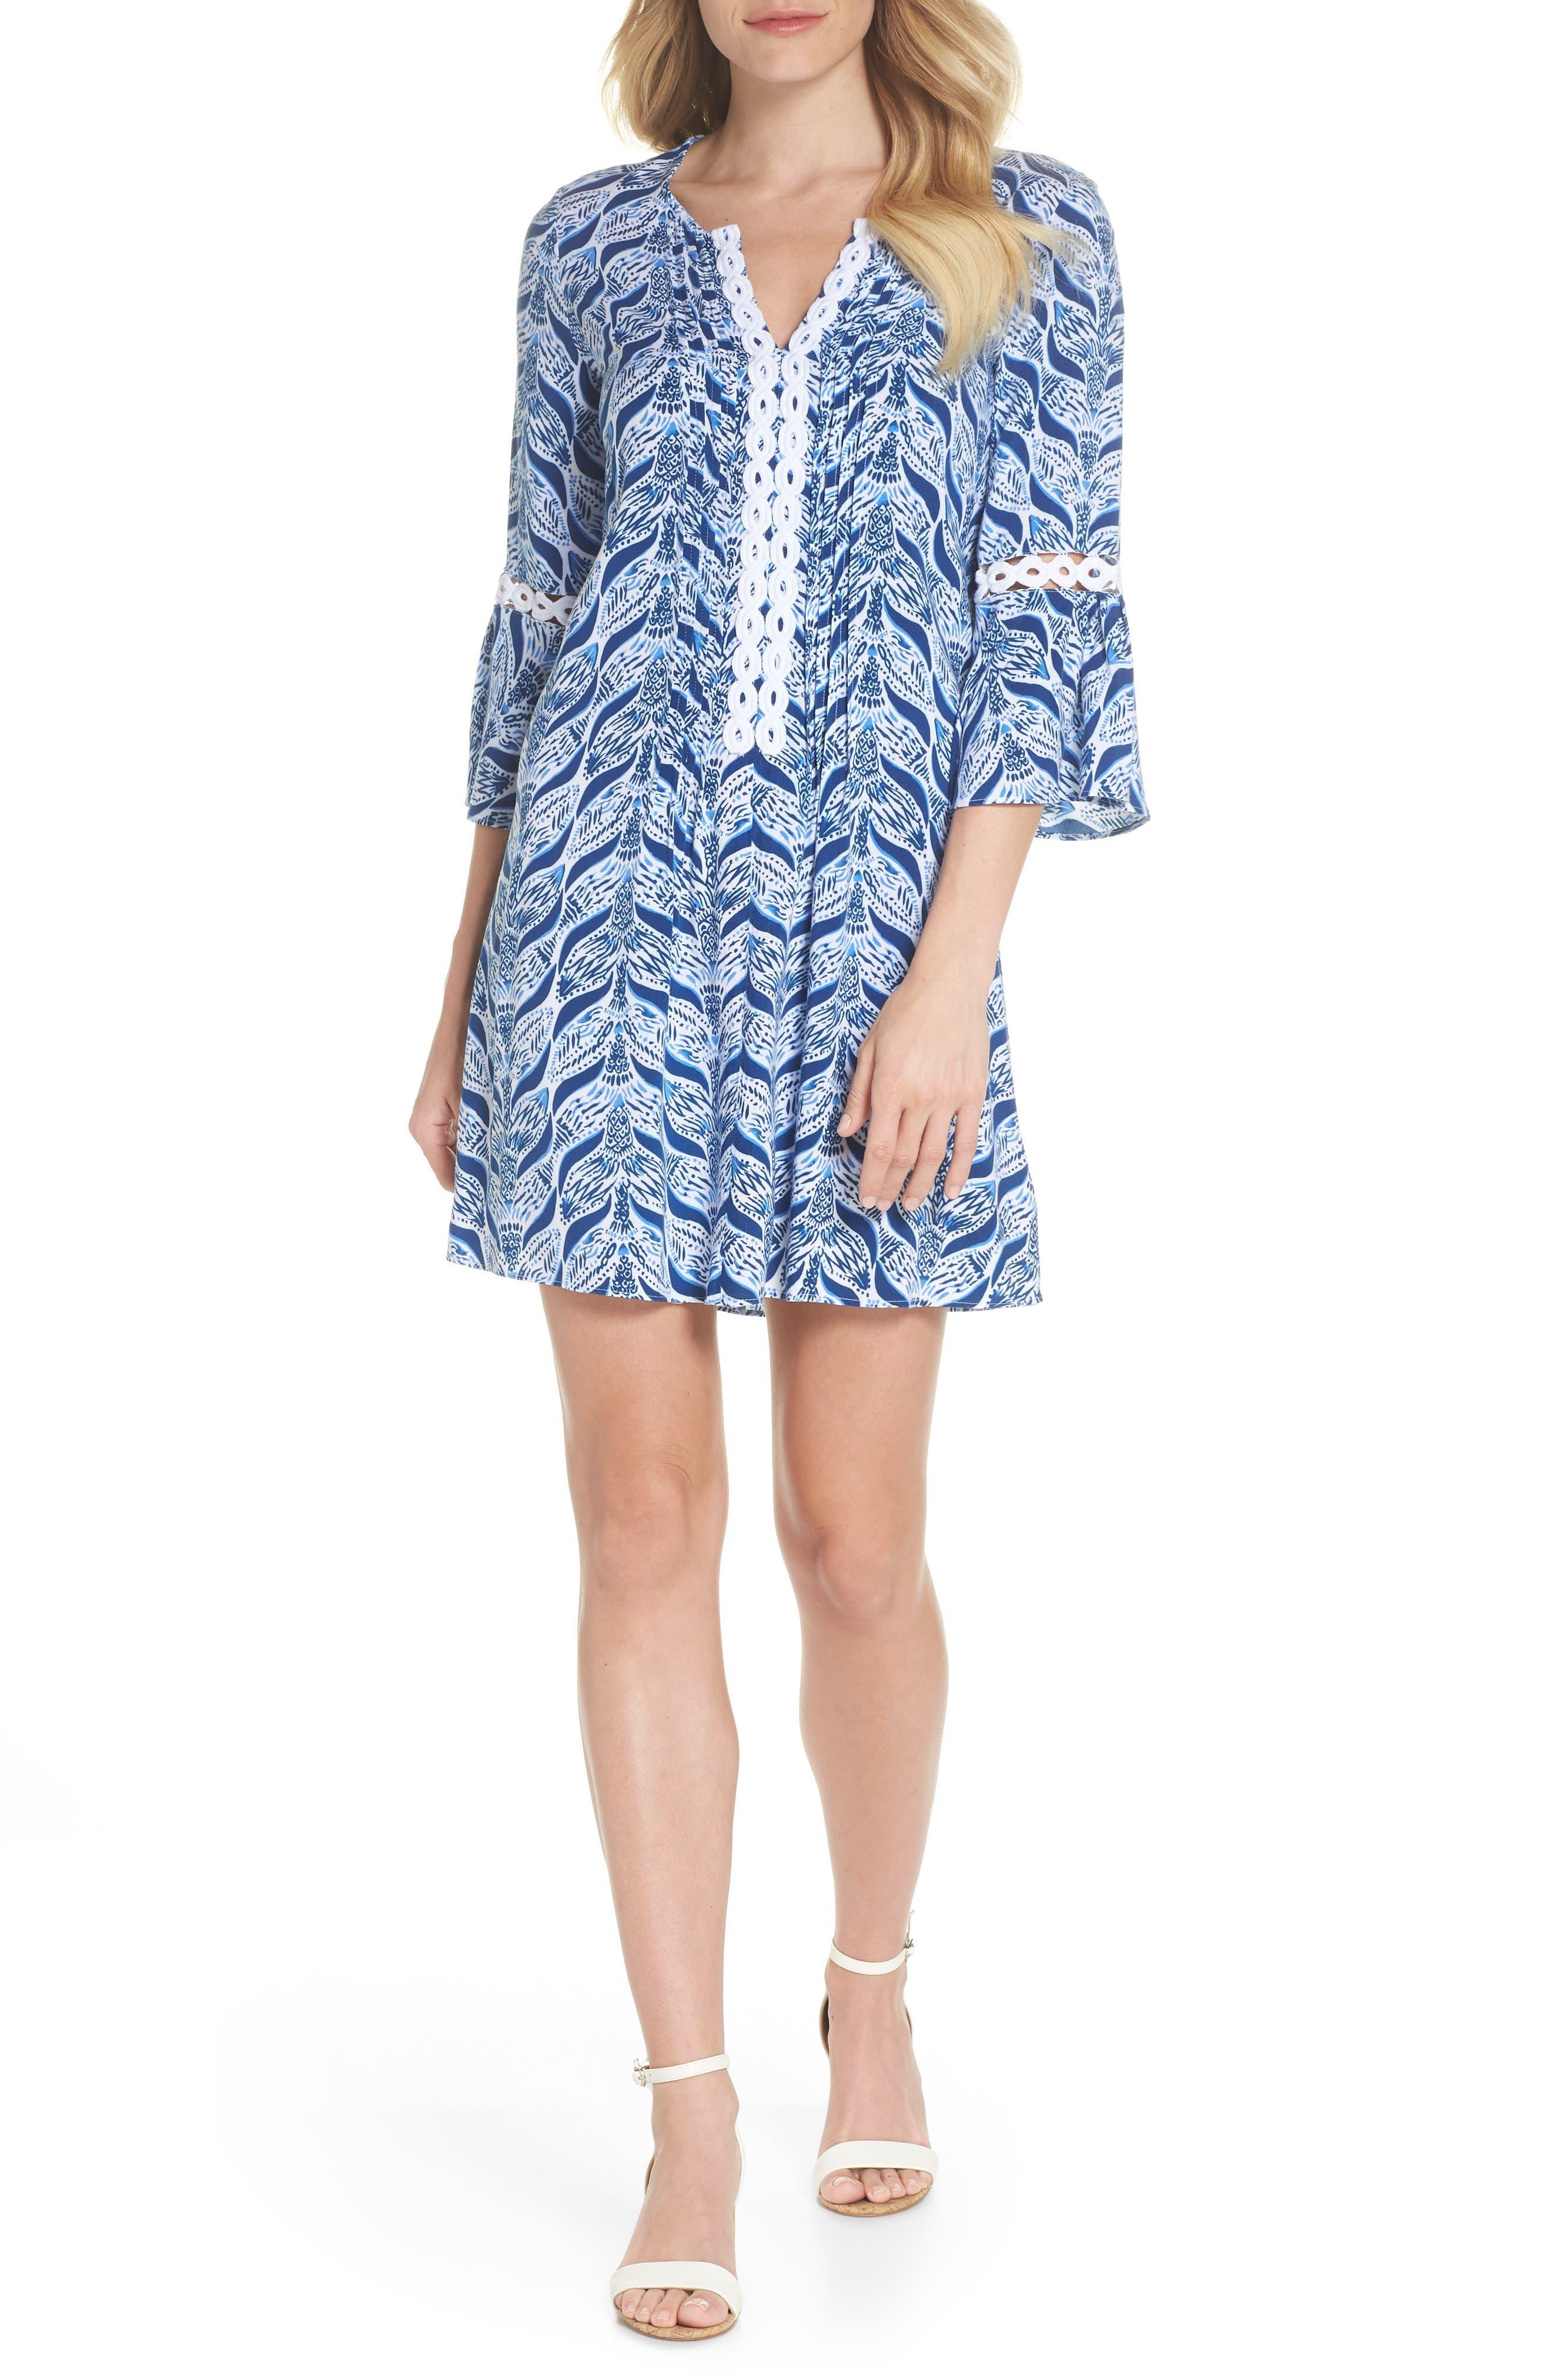 Hollie Tunic Dress,                             Main thumbnail 1, color,                             RESORT WHITE A MERMAIDS TAIL